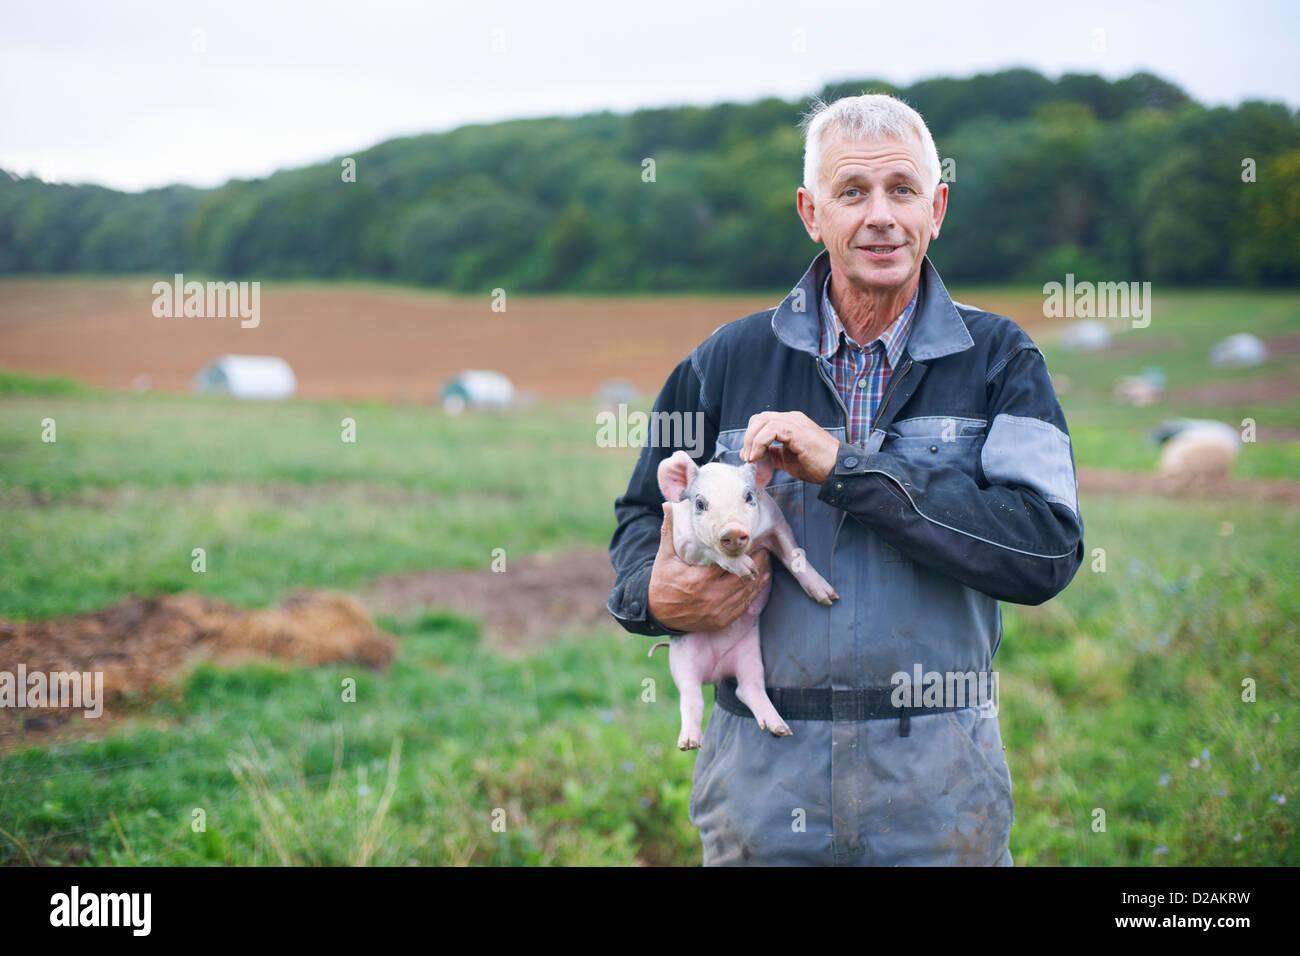 Farmer holding piglet in field Photo Stock